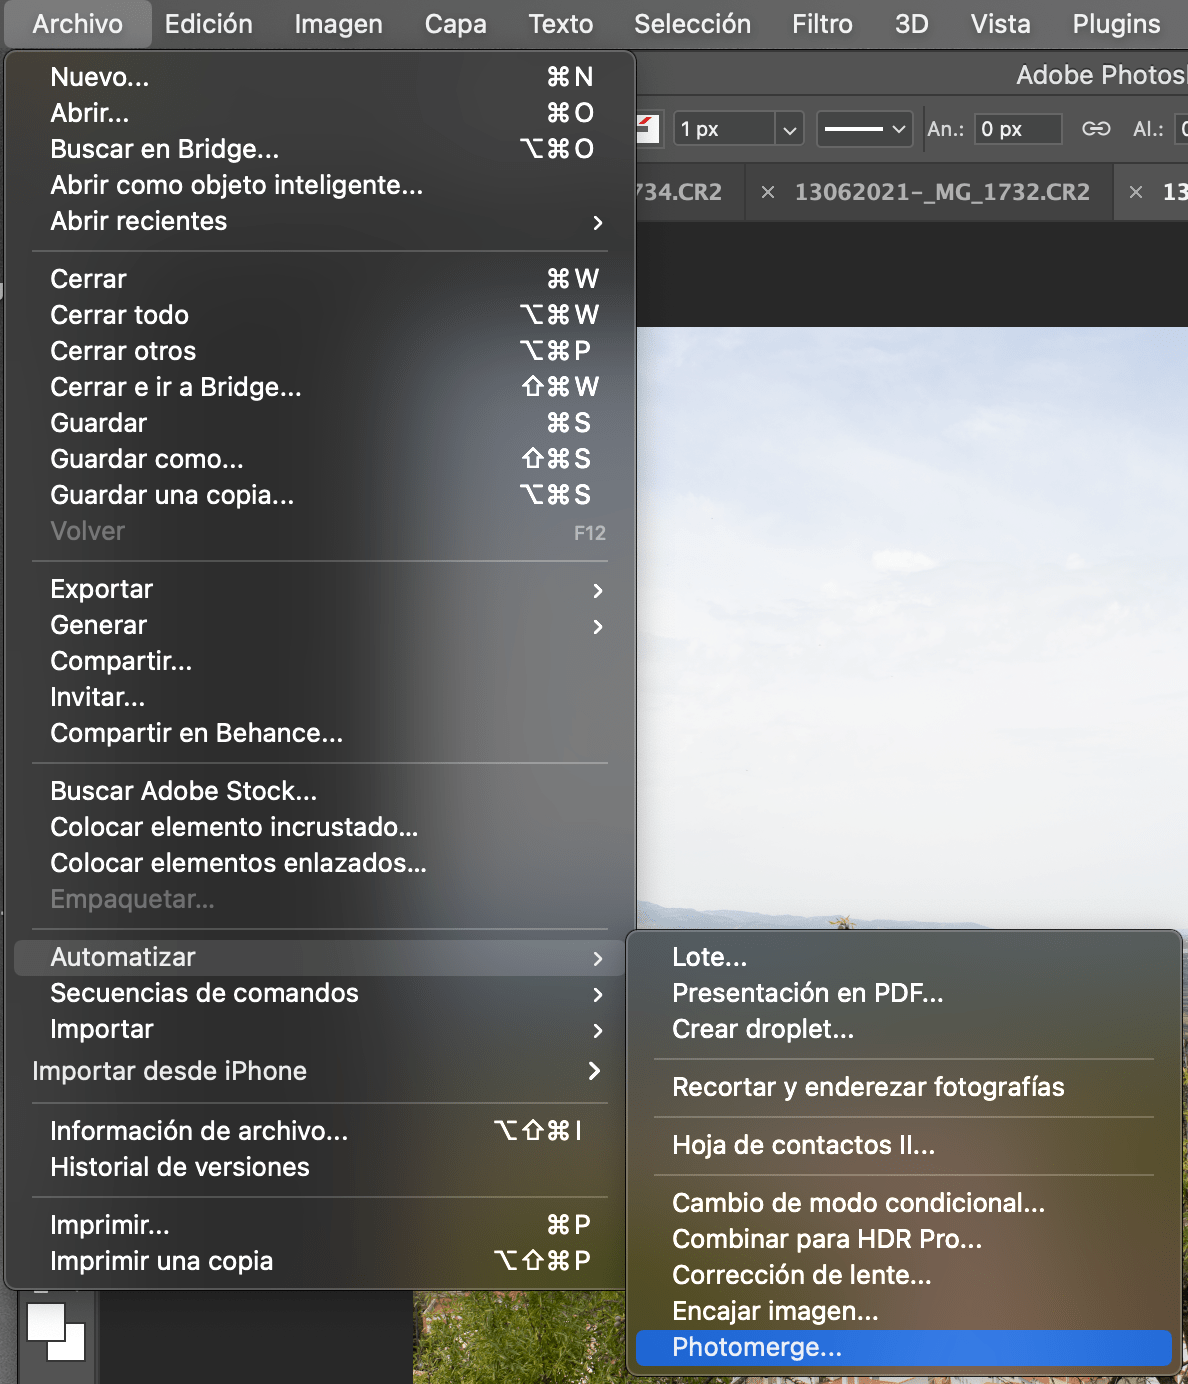 Captura de pantalla de la ruta para montar panorámica en Photoshop